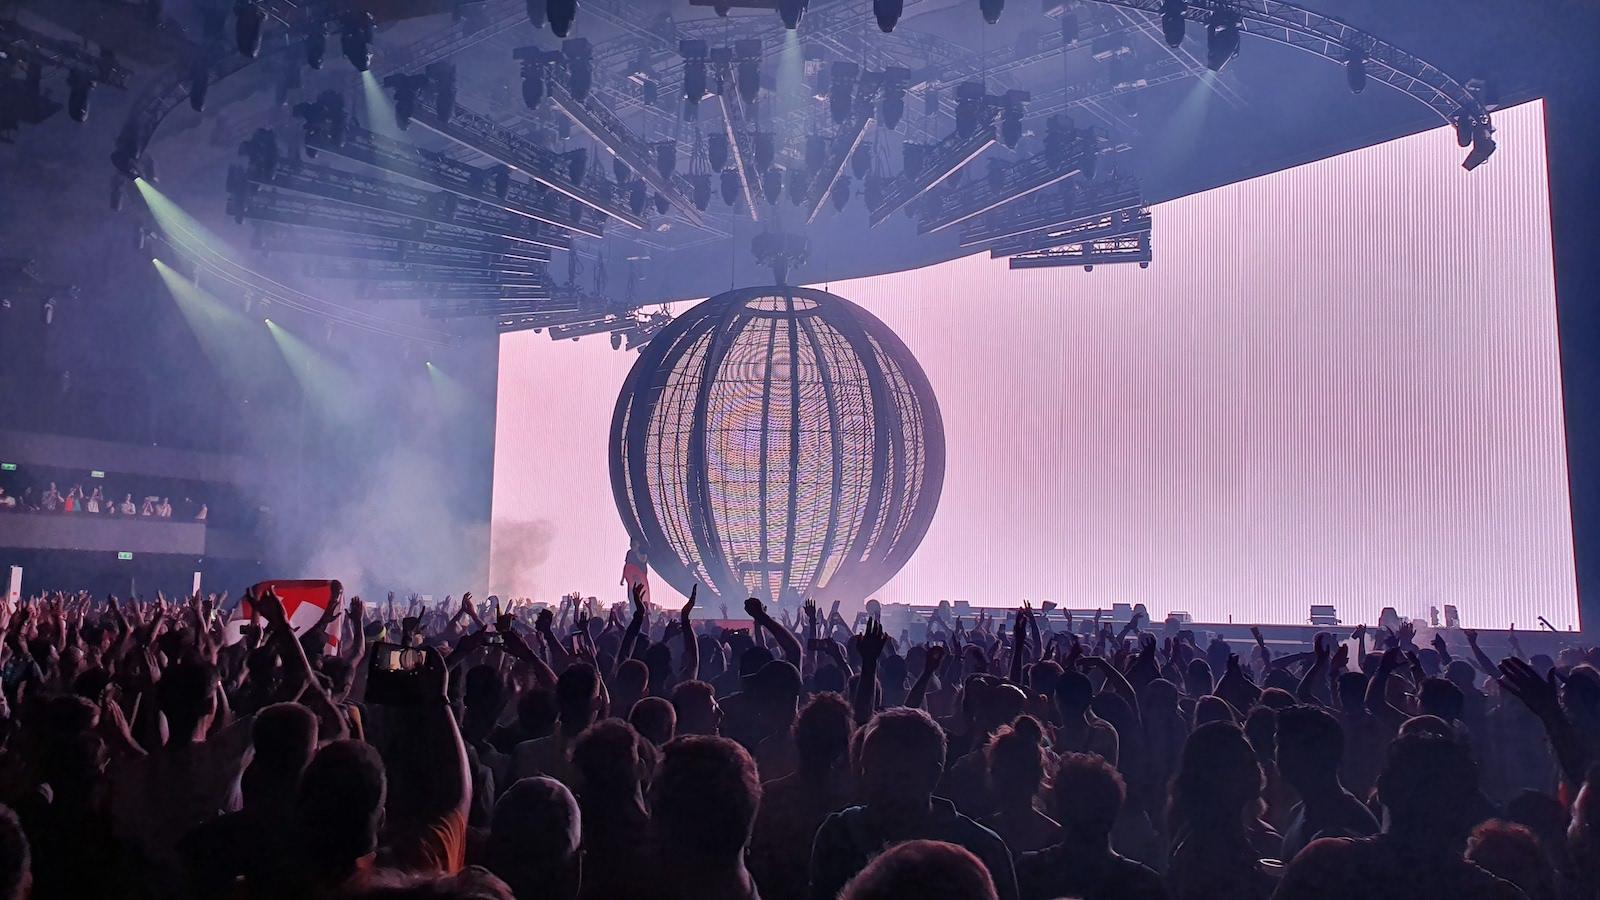 EPIC 6.0: Holosphere van Eric Prydz op Tomorrowland 2019